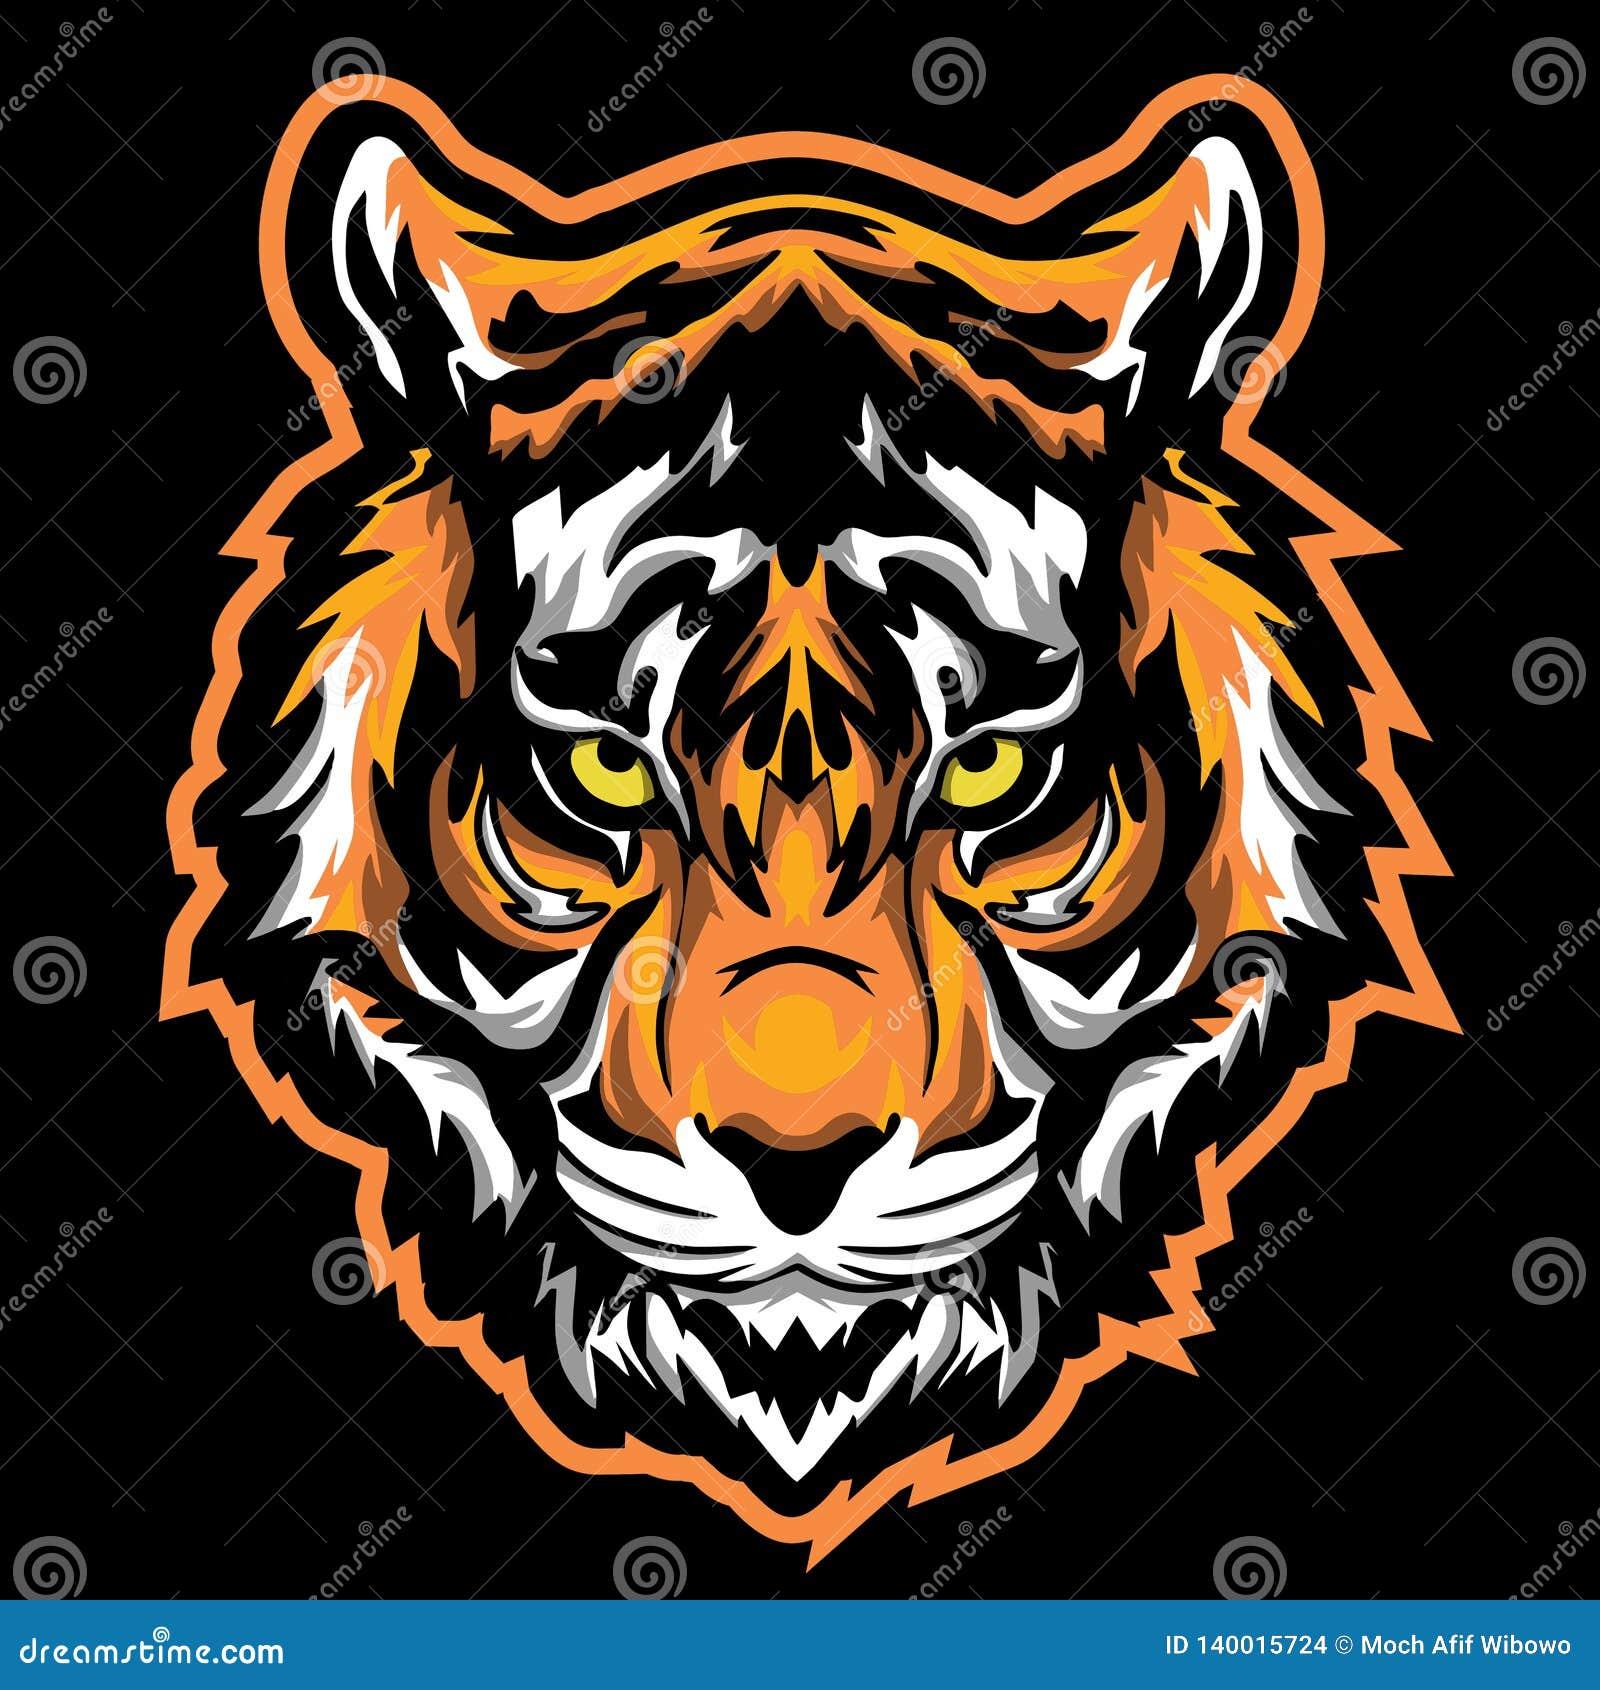 tiger logo mascot esport gaming stock vector illustration of mascot logo 140015724 https www dreamstime com tiger logo mascot esport gaming image140015724